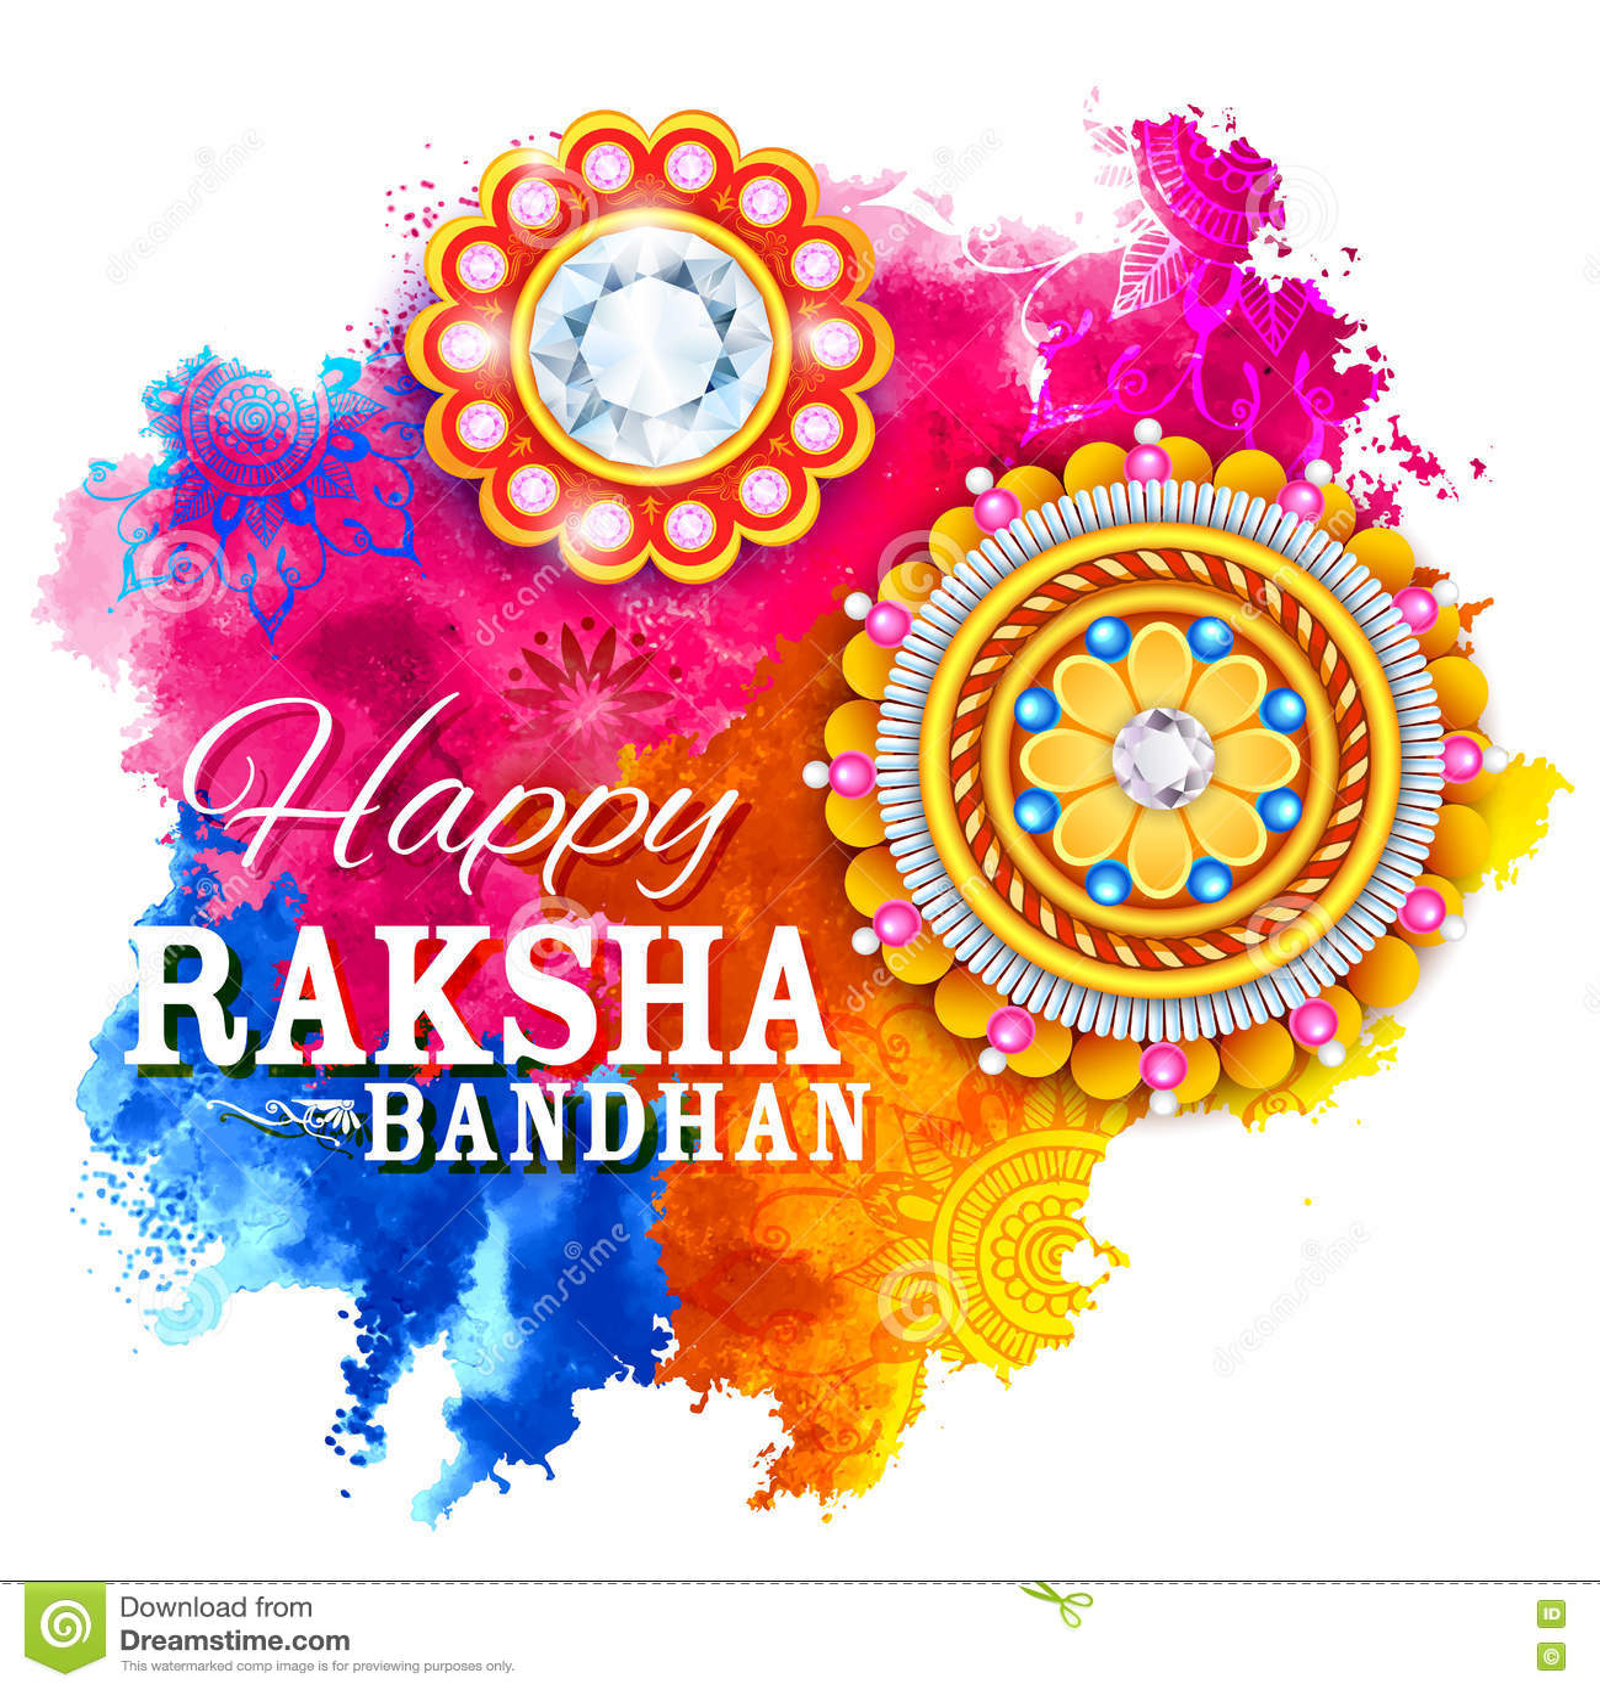 Rakhi Festival Quotes Brother: Decorative Rakhi For Raksha Bandhan Background Stock